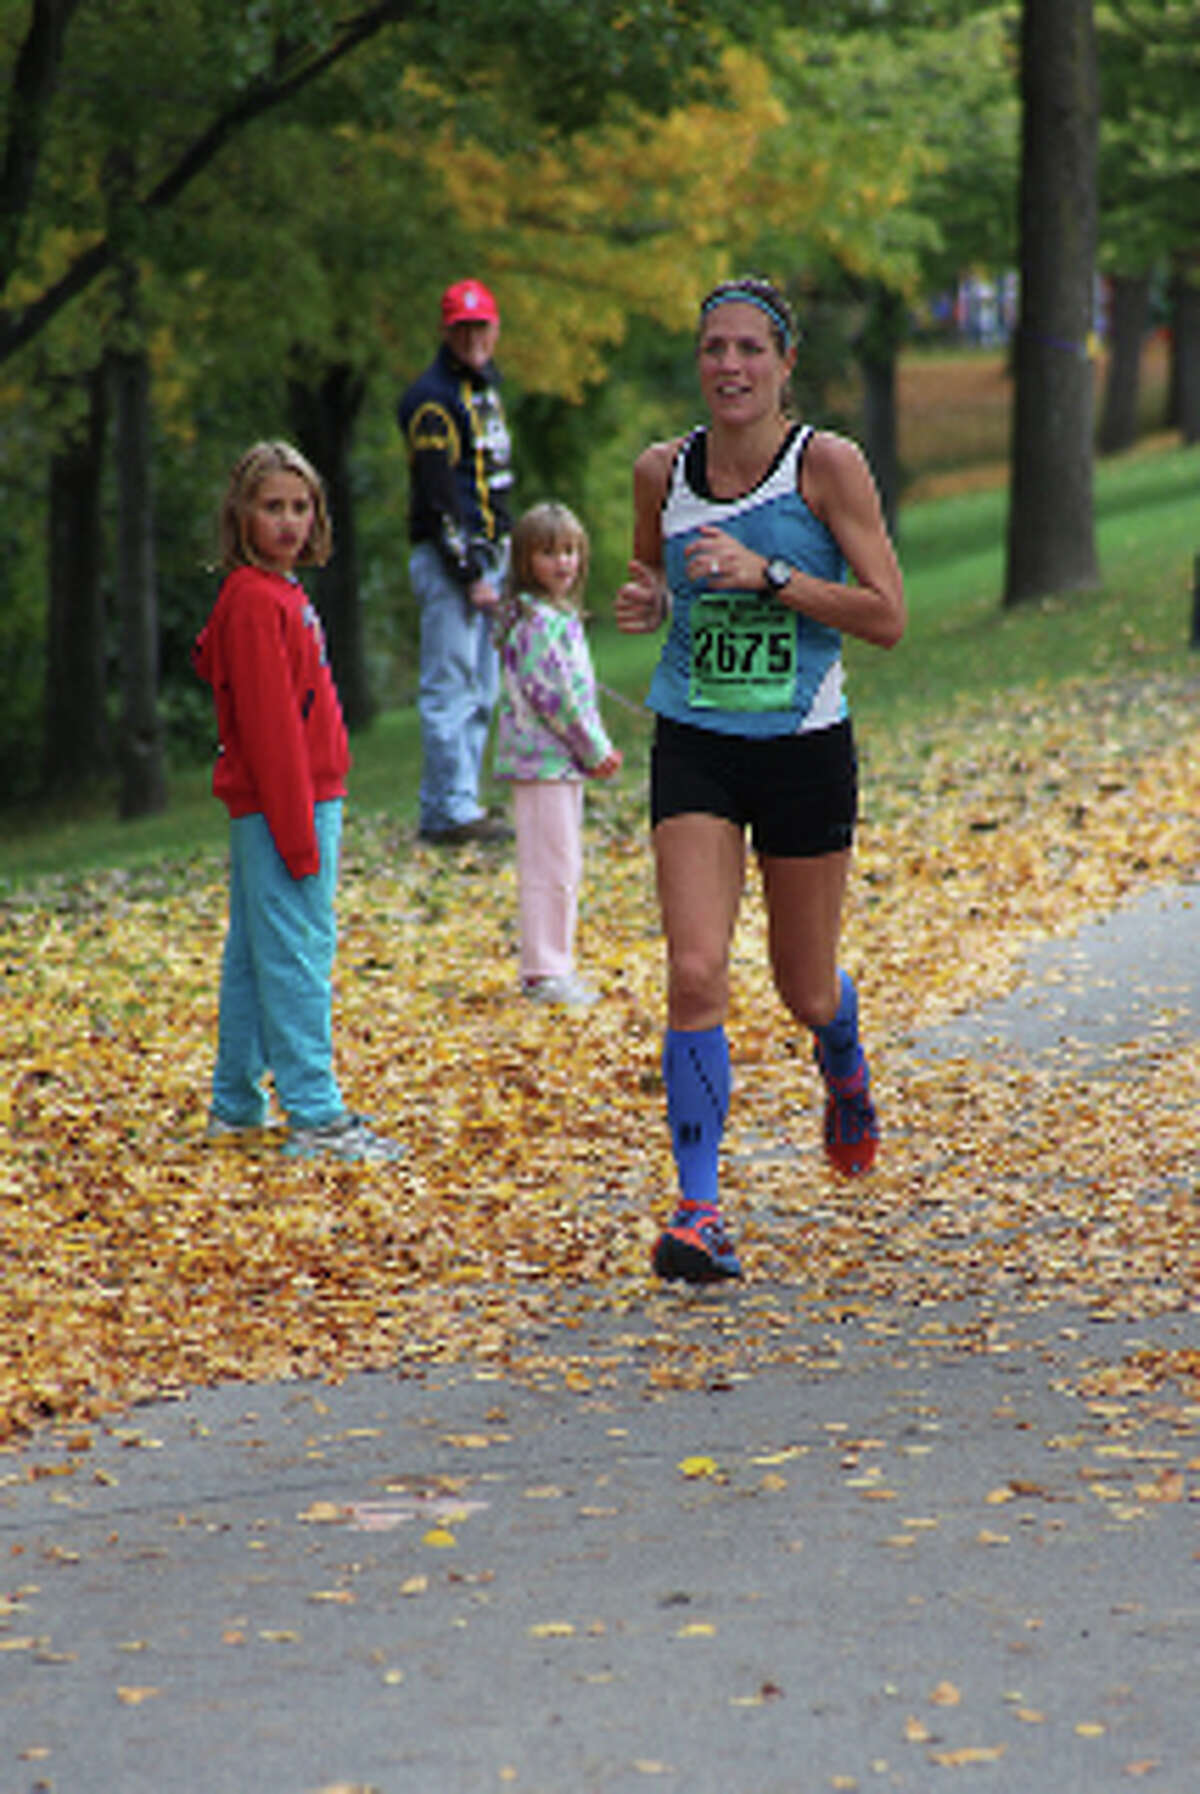 Gretchen Oliver, a local runner who is running the New York City Marathon on Sunday, Nov. 4. (Courtesy of Gretchen Oliver)